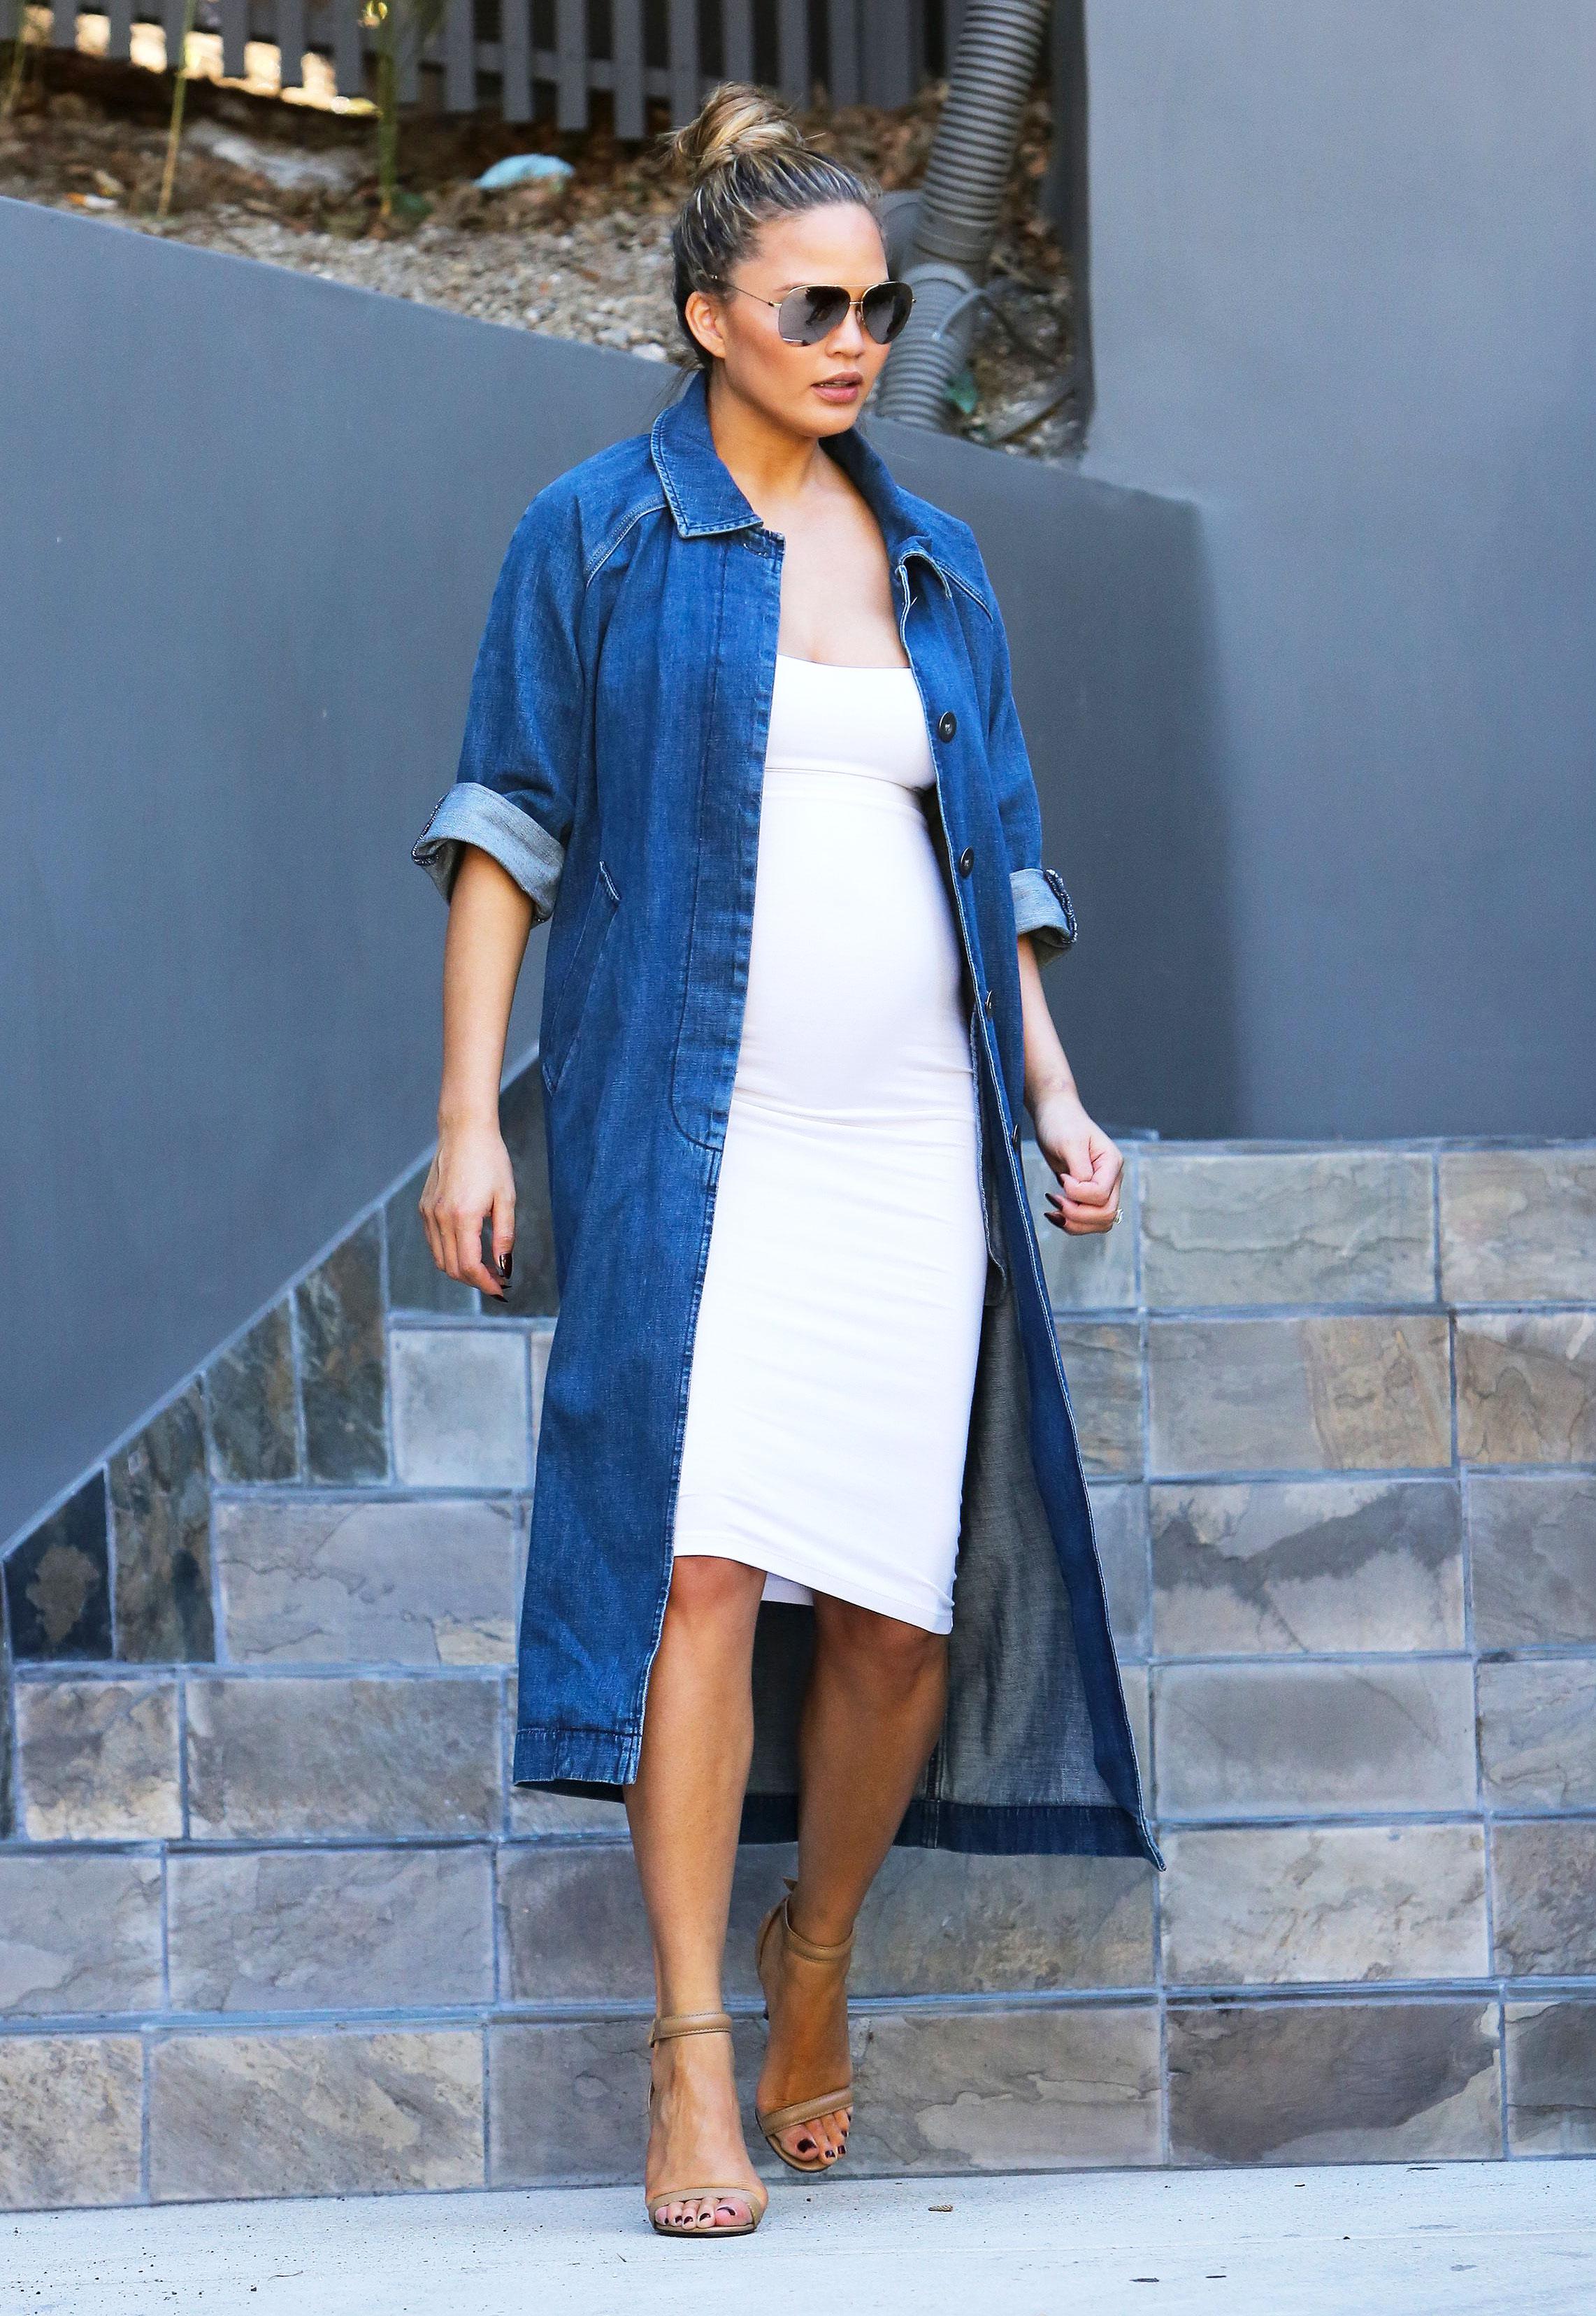 Pregnant Chrissy Teigen Pulls Off Denim Duster Coat